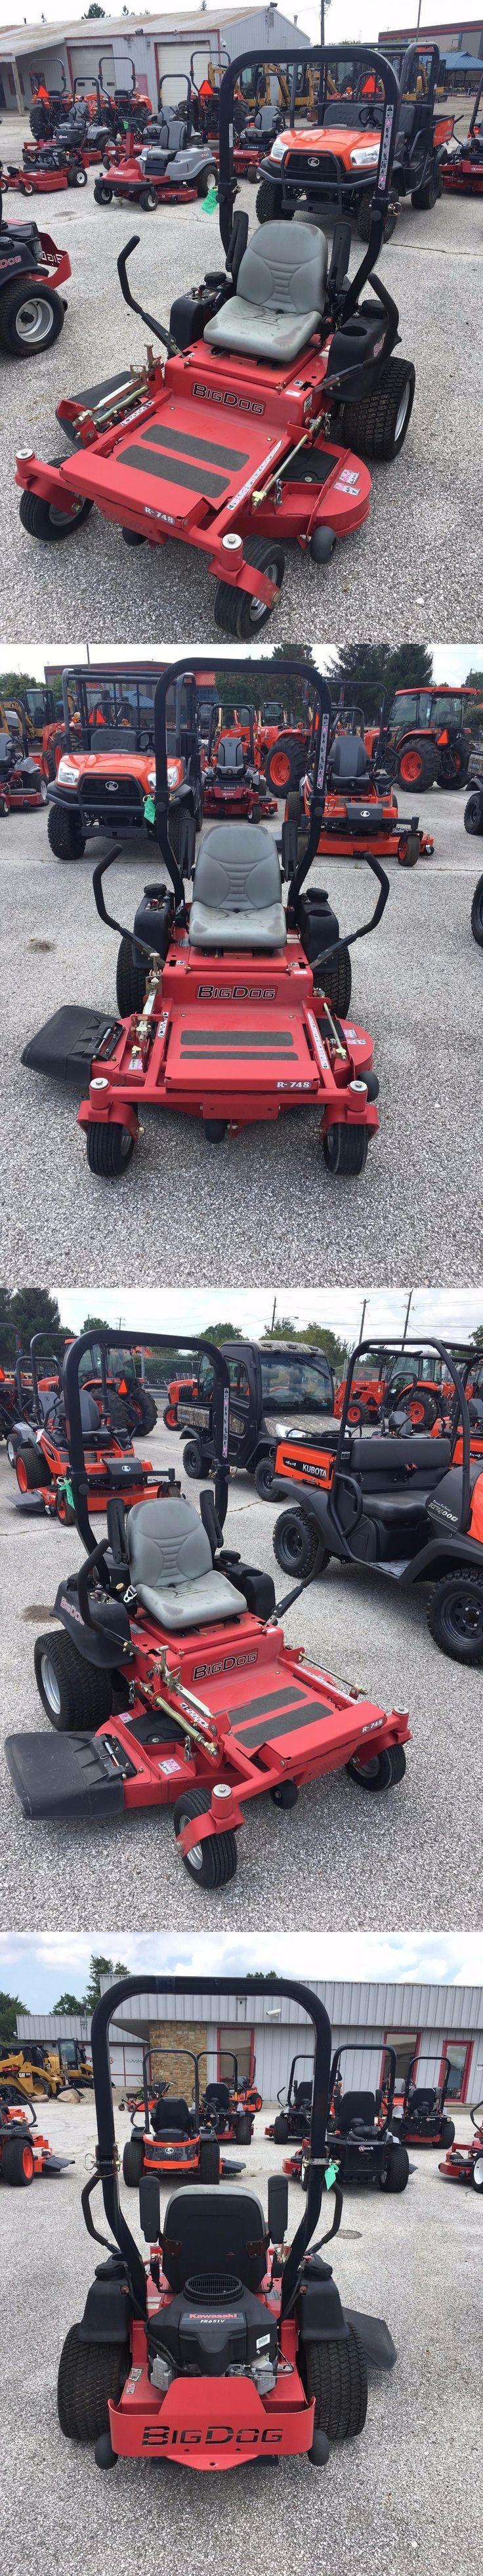 Riding Mowers 177021: Big Dog 48 Ride On Mower - Kawasaki Power - New 2011 Floor Model -081 -> BUY IT NOW ONLY: $3850 on eBay!